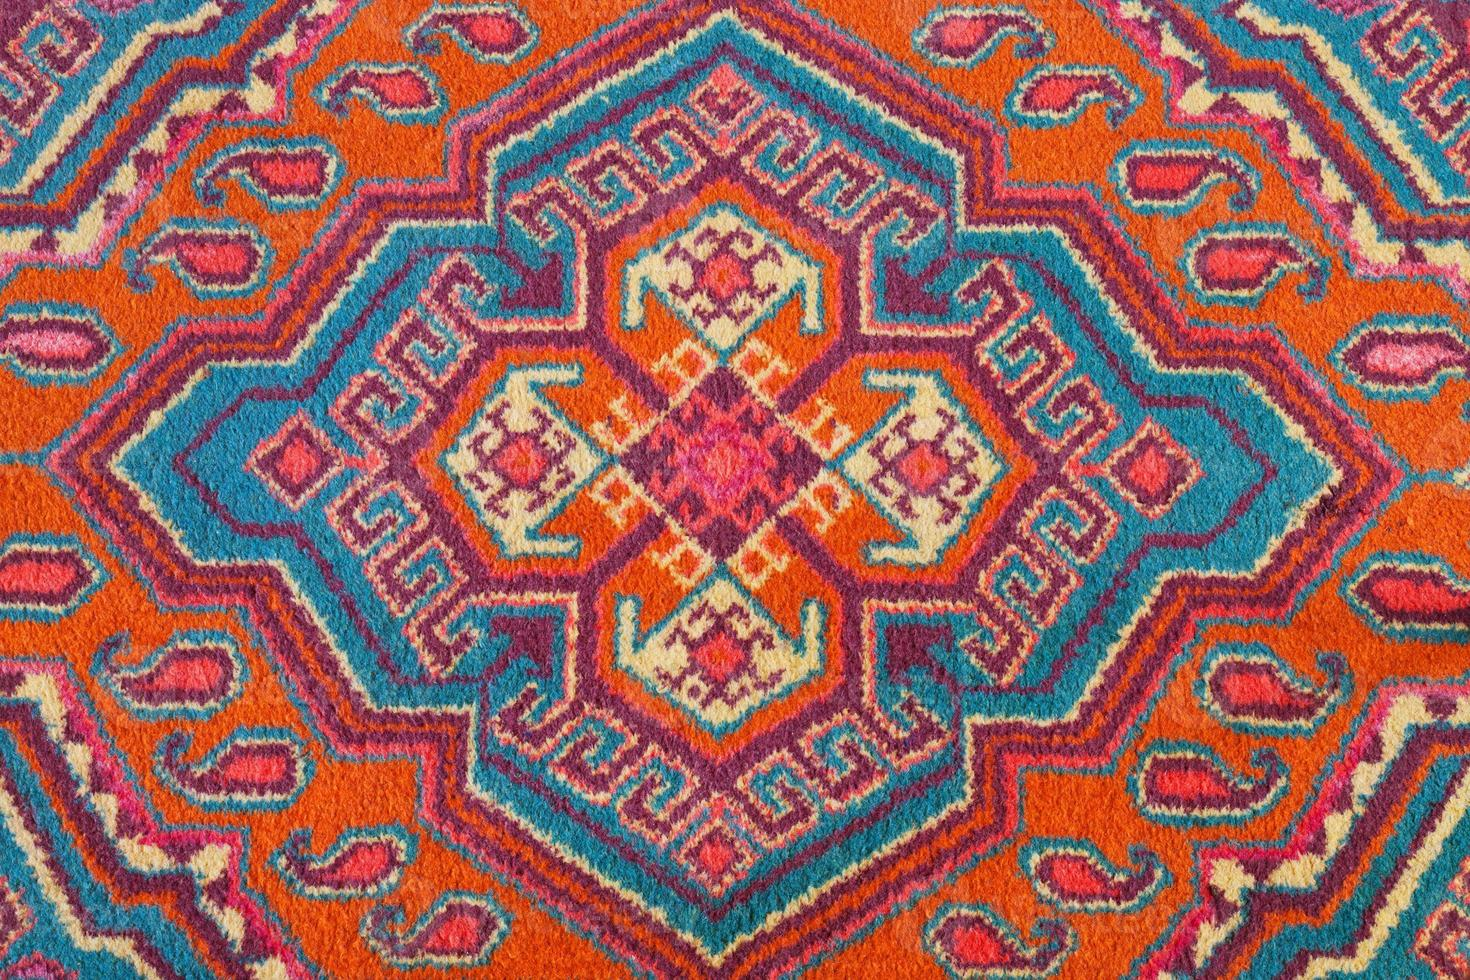 adorno de alfombra asiática central foto